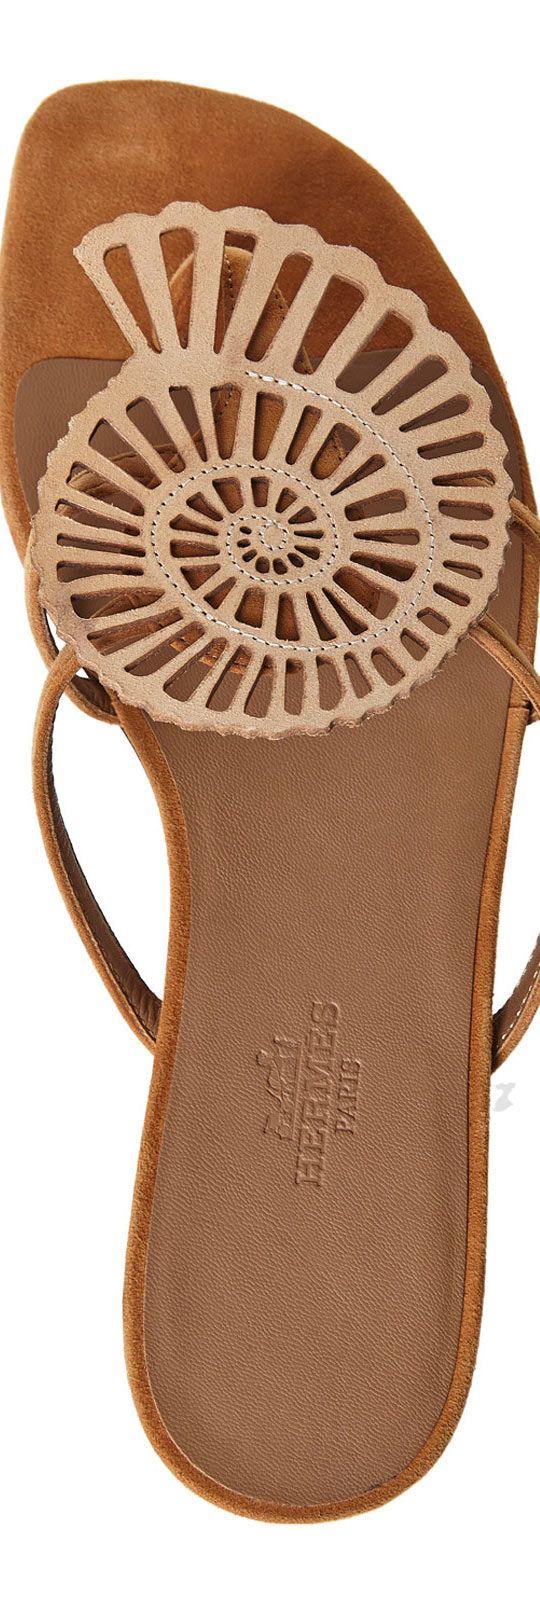 Hermes Brown Seashell Thong Sandals